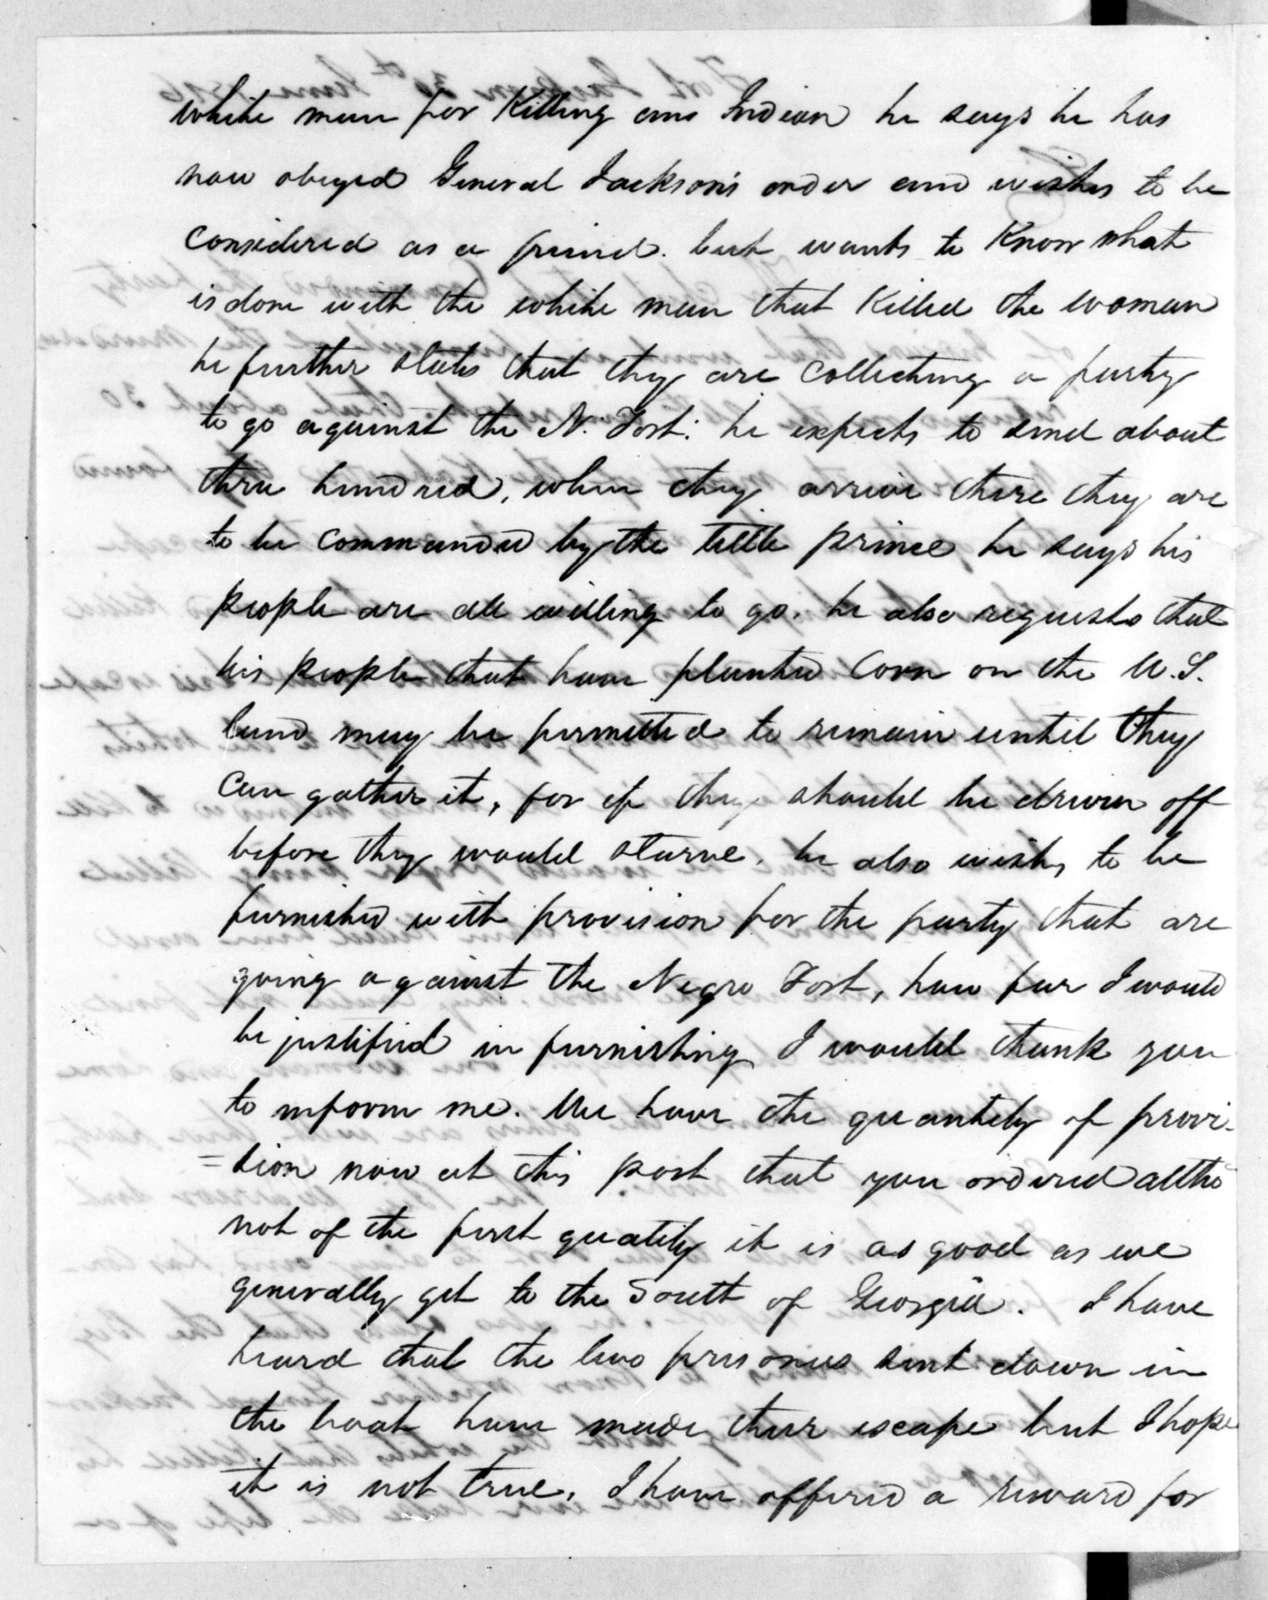 John Machesney to Edmund Pendleton Gaines, June 30, 1816